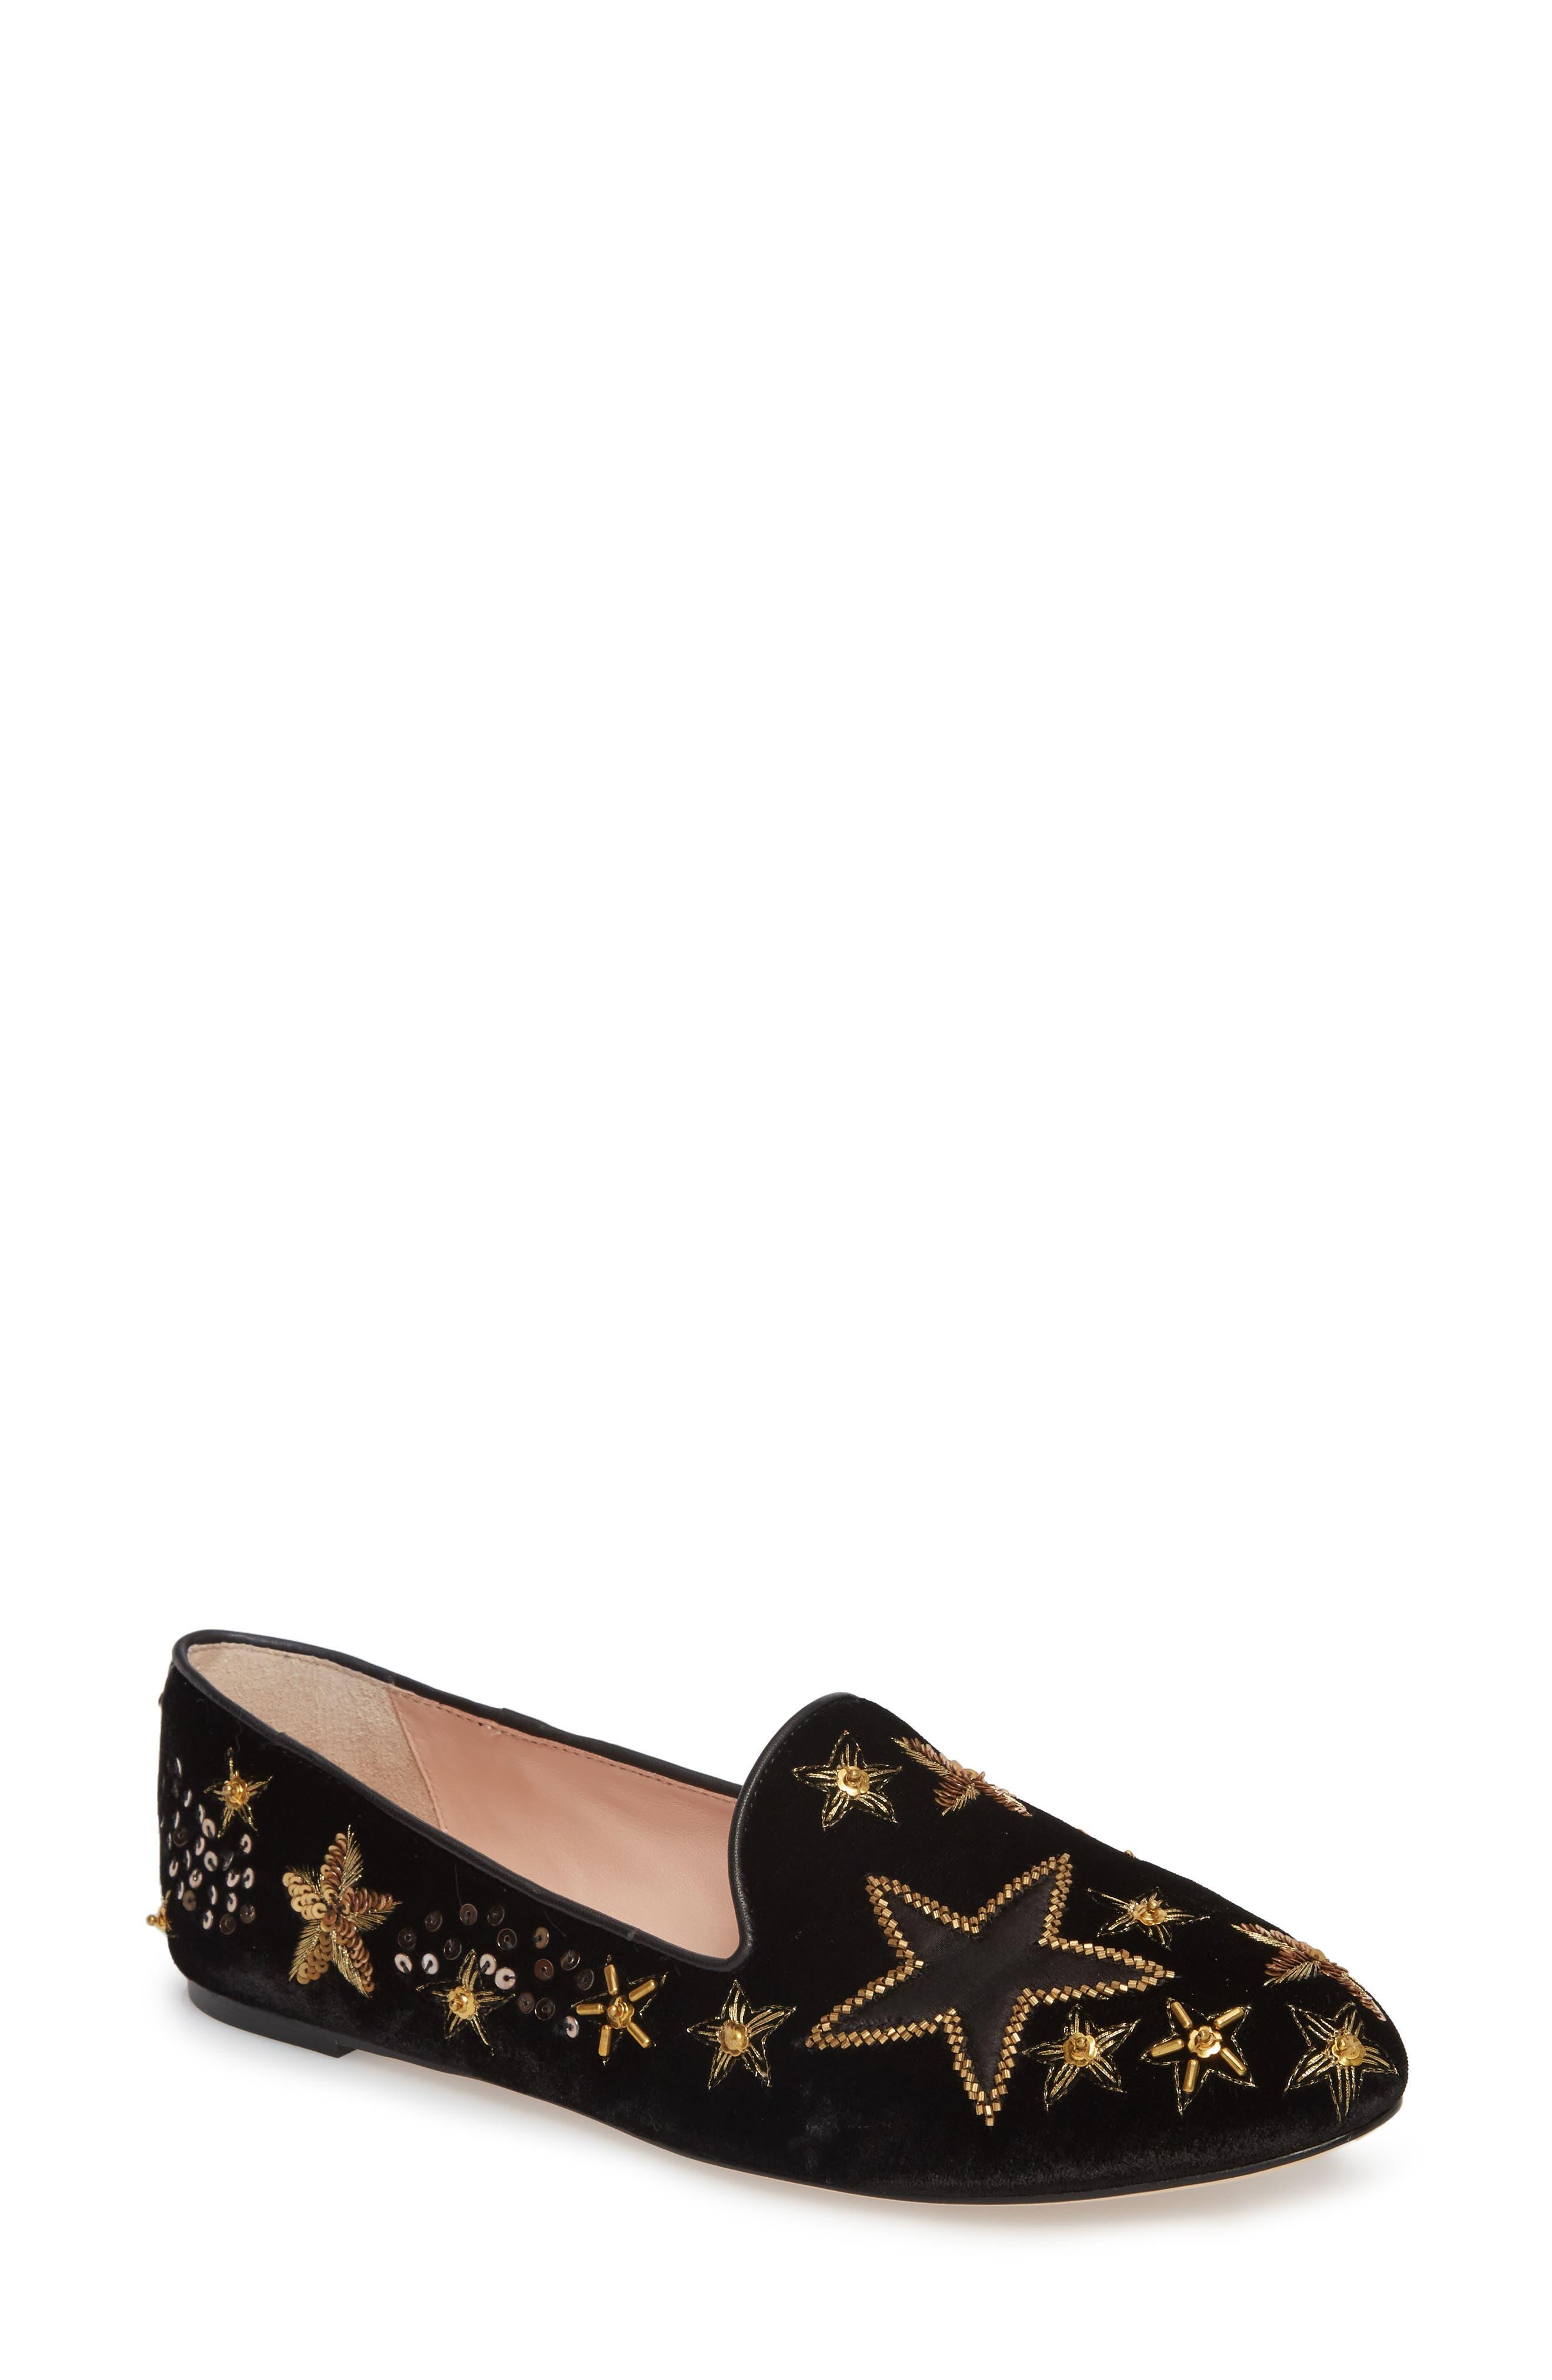 stelli embellished loafer,                             Main thumbnail 1, color,                             Black Velvet